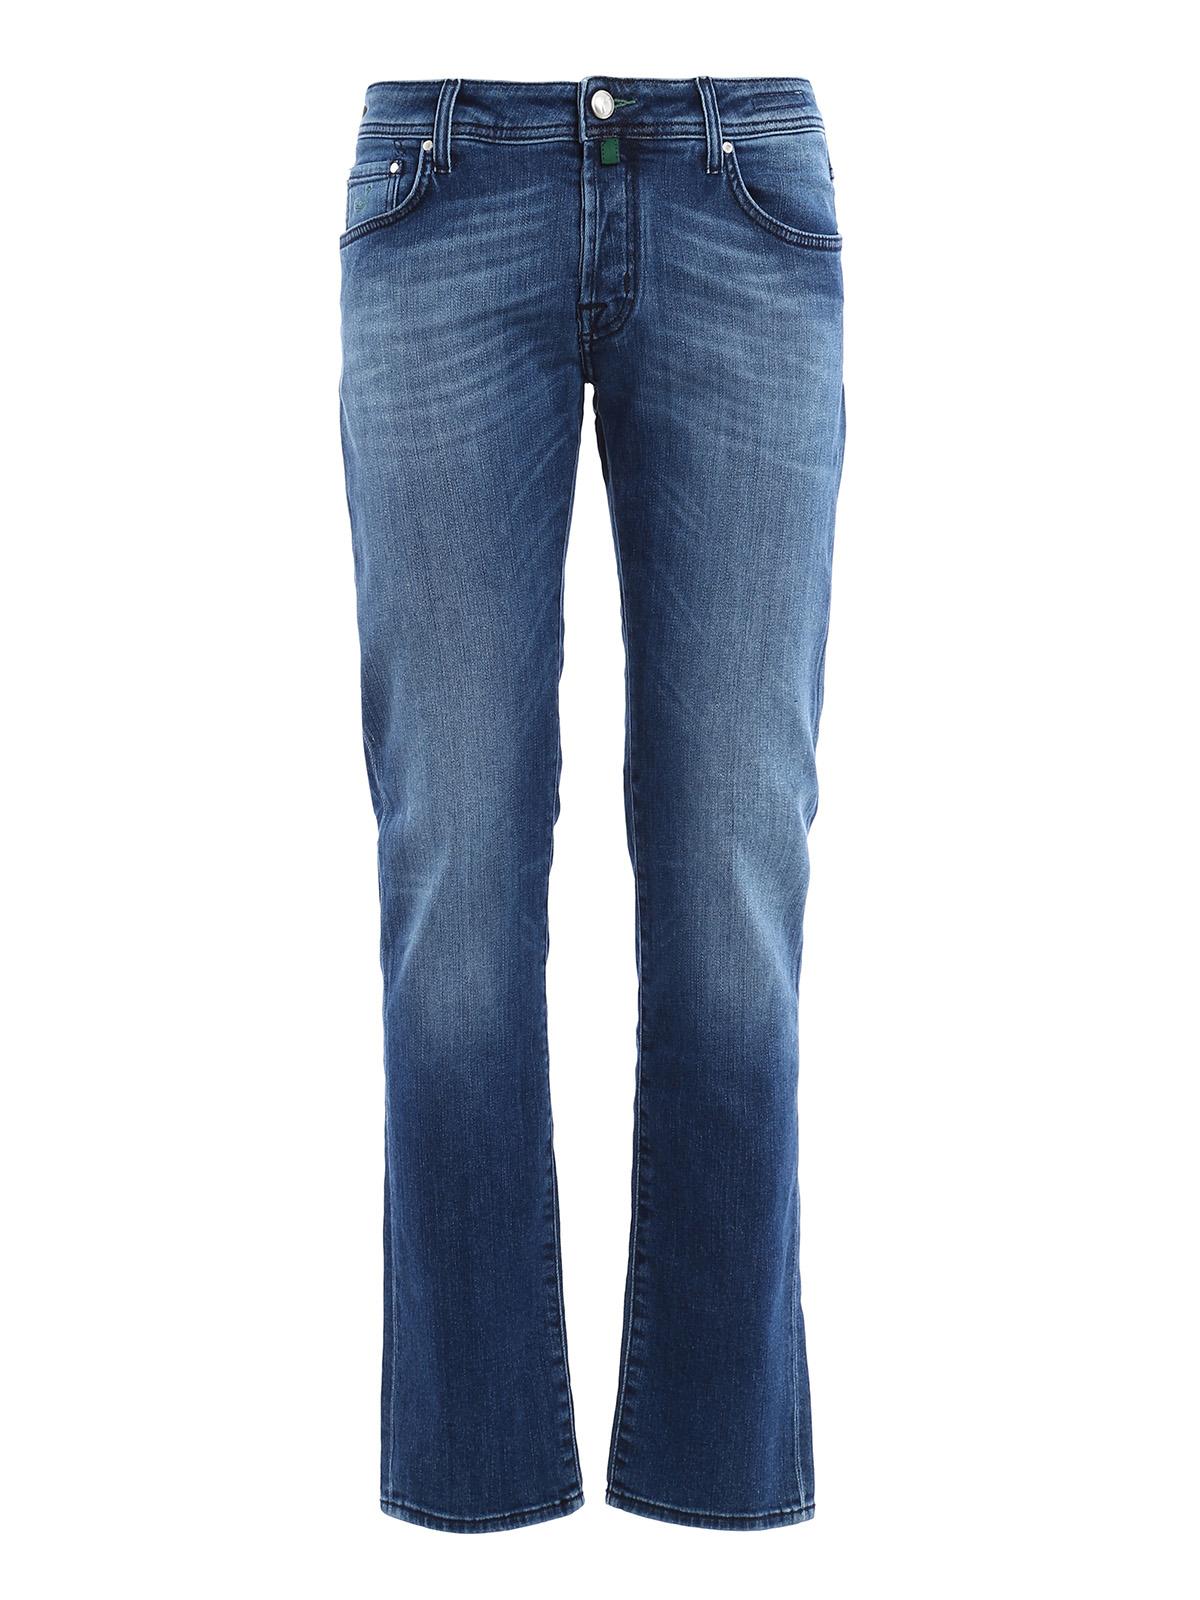 jacob cohen straight leg jeans dark wash straight. Black Bedroom Furniture Sets. Home Design Ideas